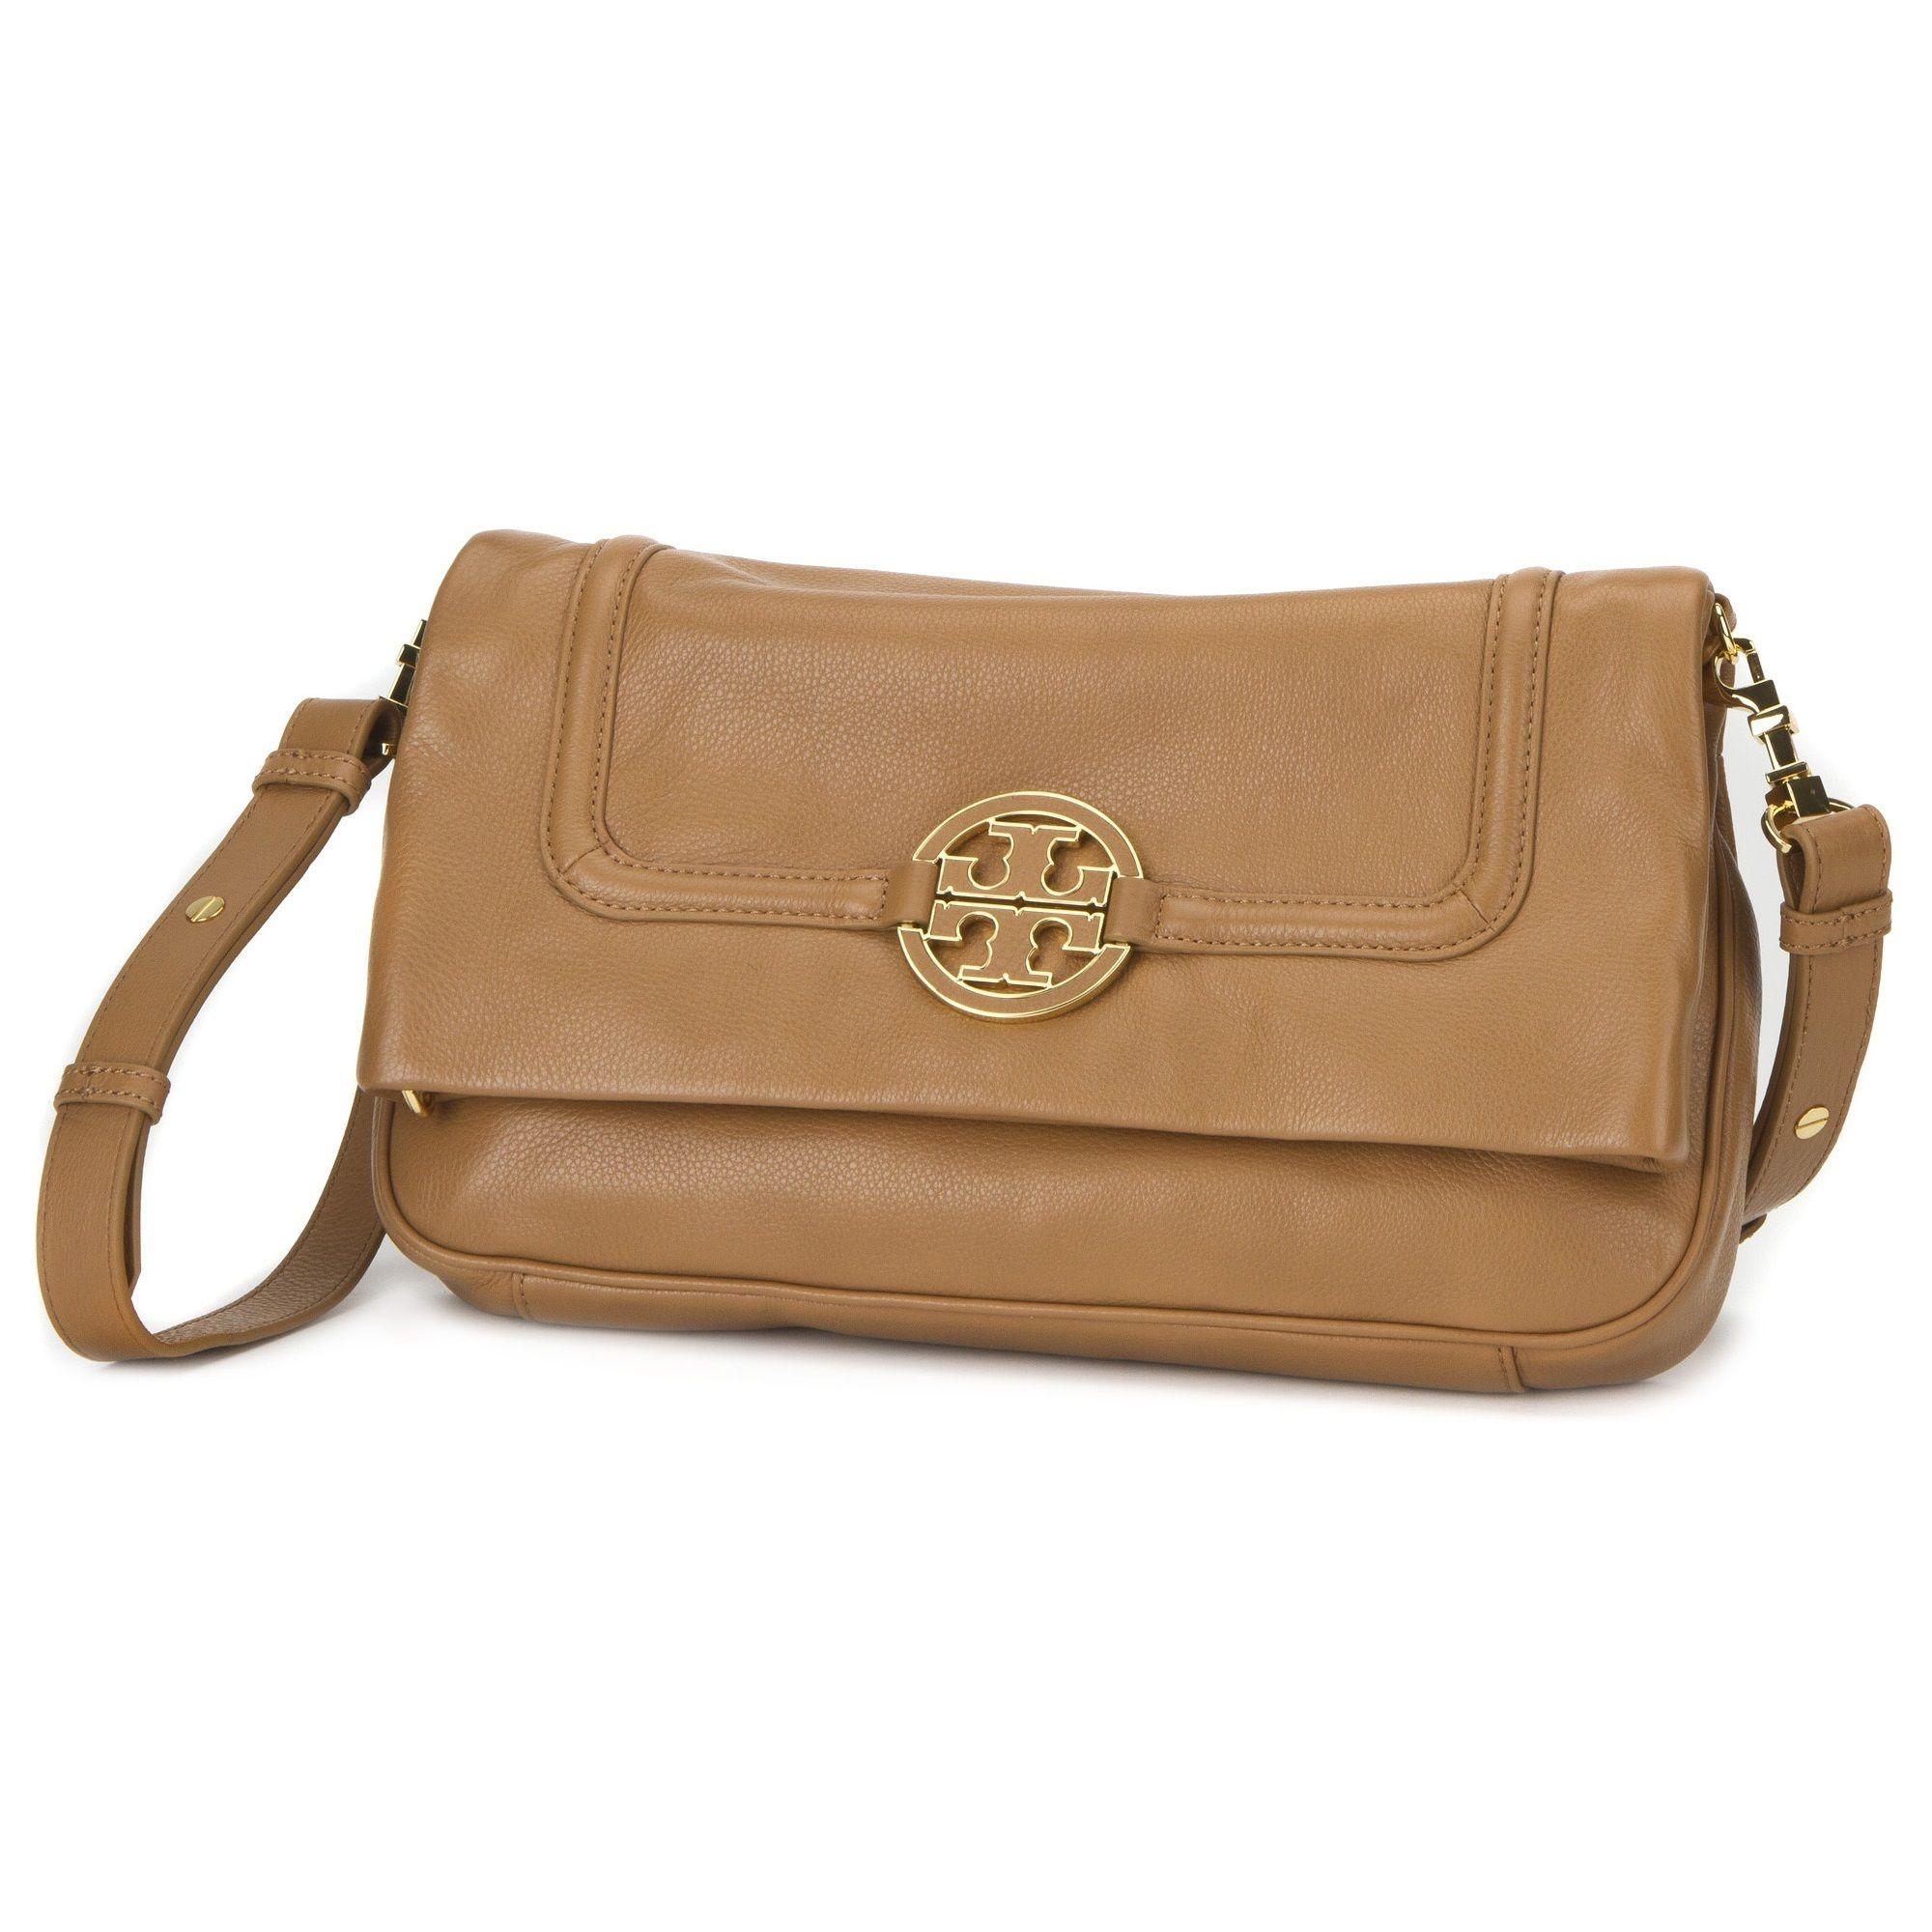 f05a3a5f91b8 Tory Burch Amanda Foldover Royal Tan Messenger Bag